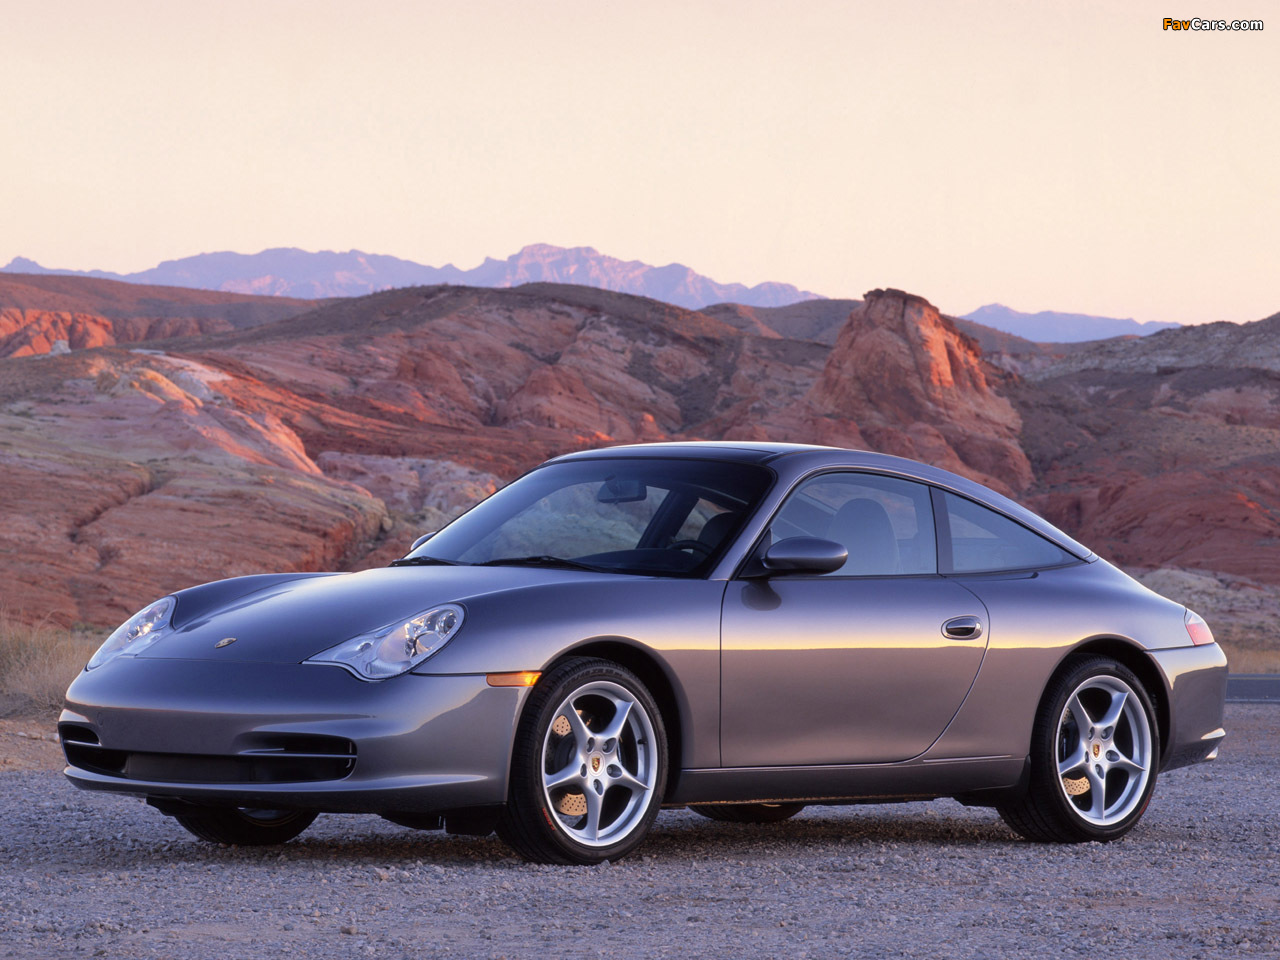 Porsche 911 Targa Us Spec 996 2002 05 Images 1280x960